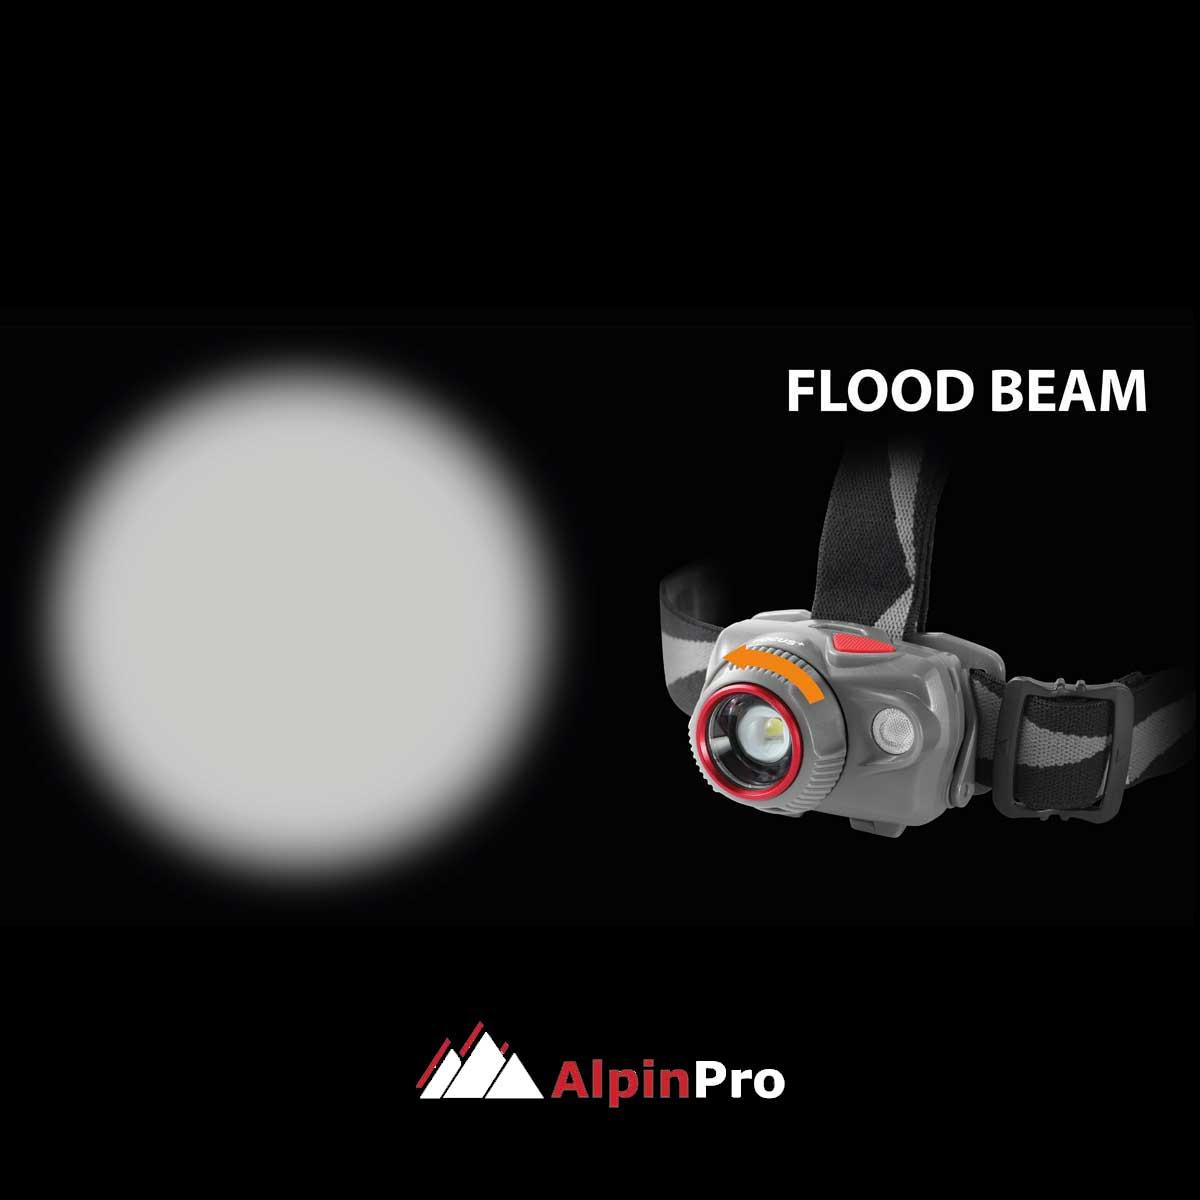 Flashlight-HL-01HB-ALPINPRO-NIGHT-floodbeam